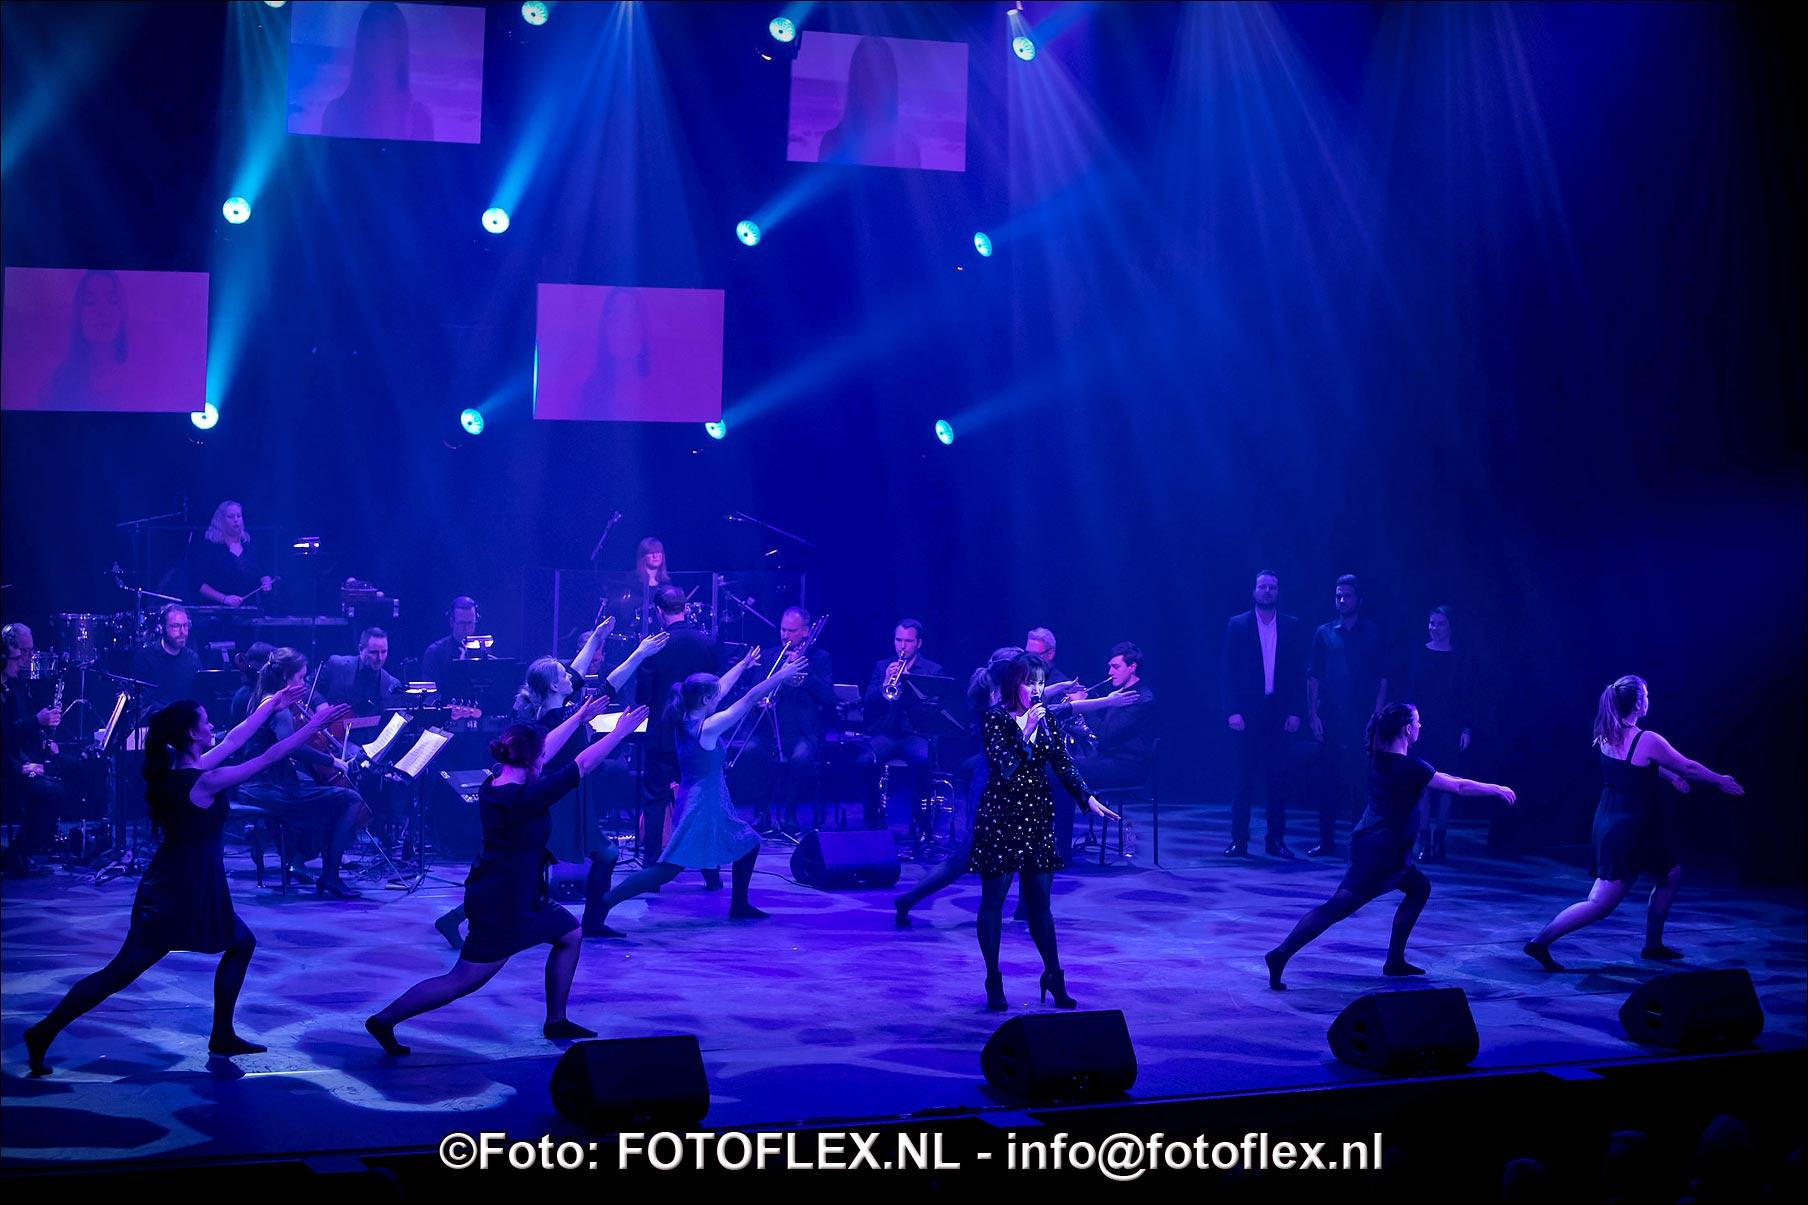 0643-CopyrightFOTOFLEX.NL07012020